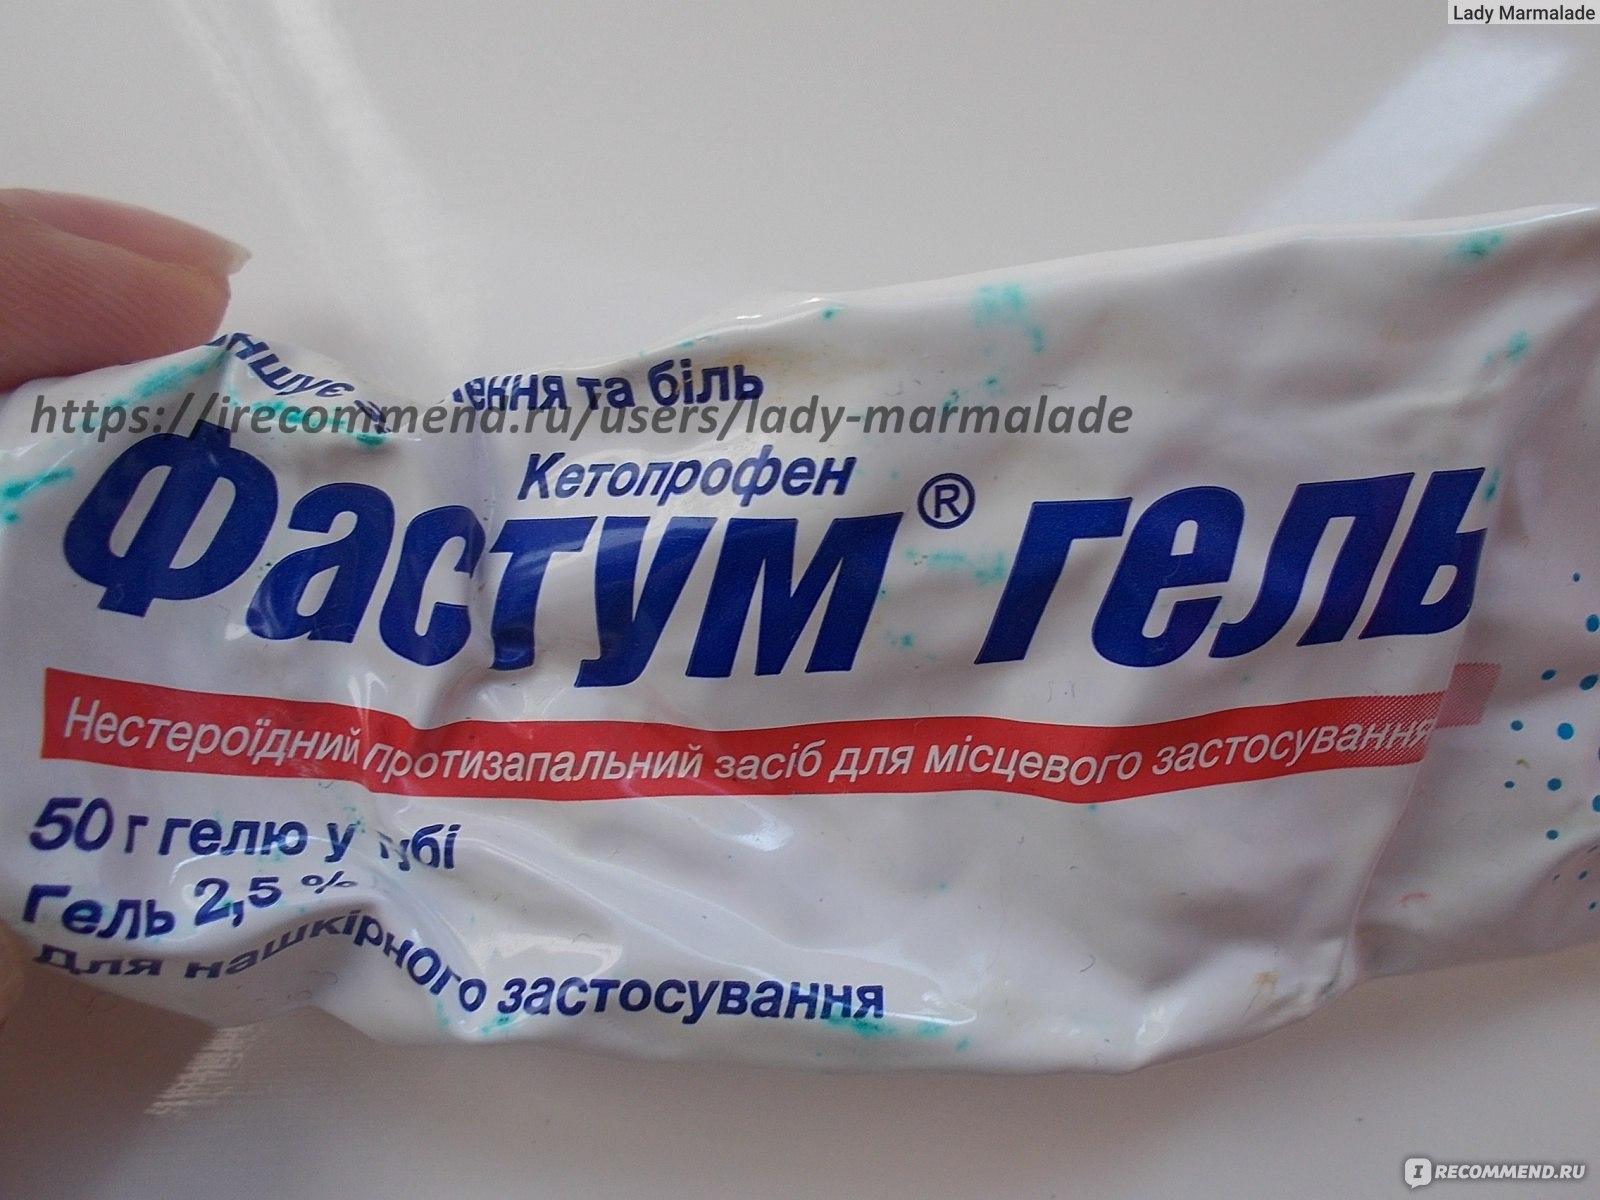 Фастум гель